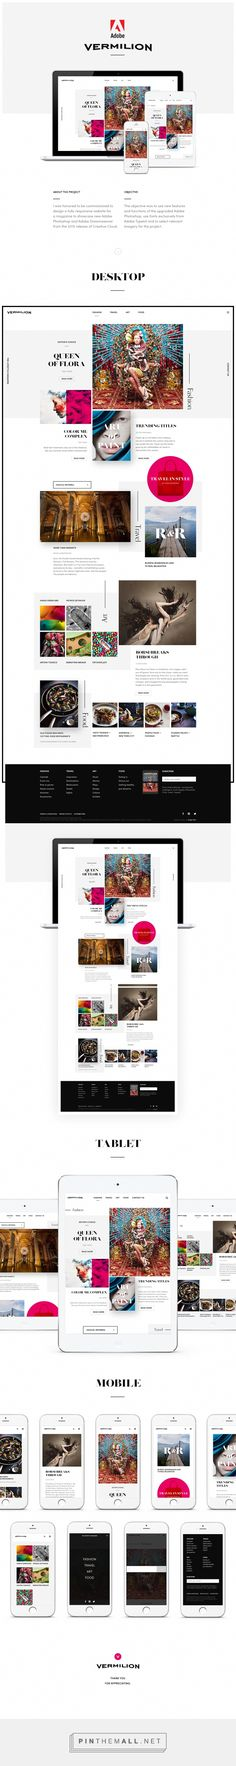 Official Showcase #Website for Adobe on Behance